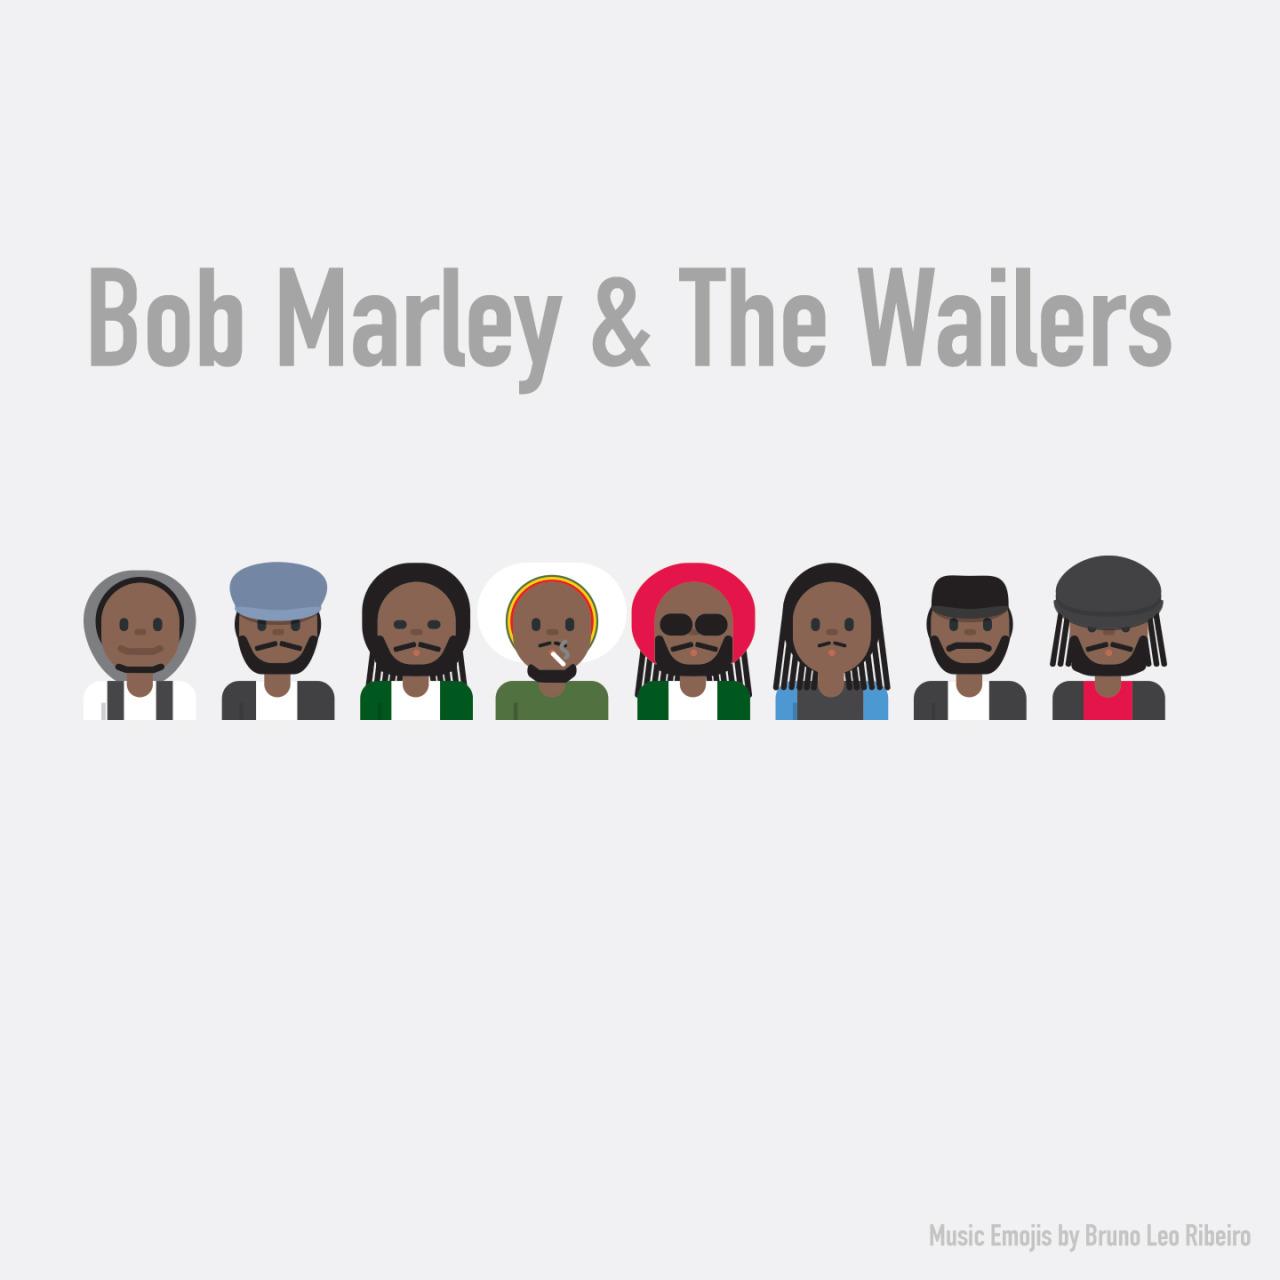 music-emoji8